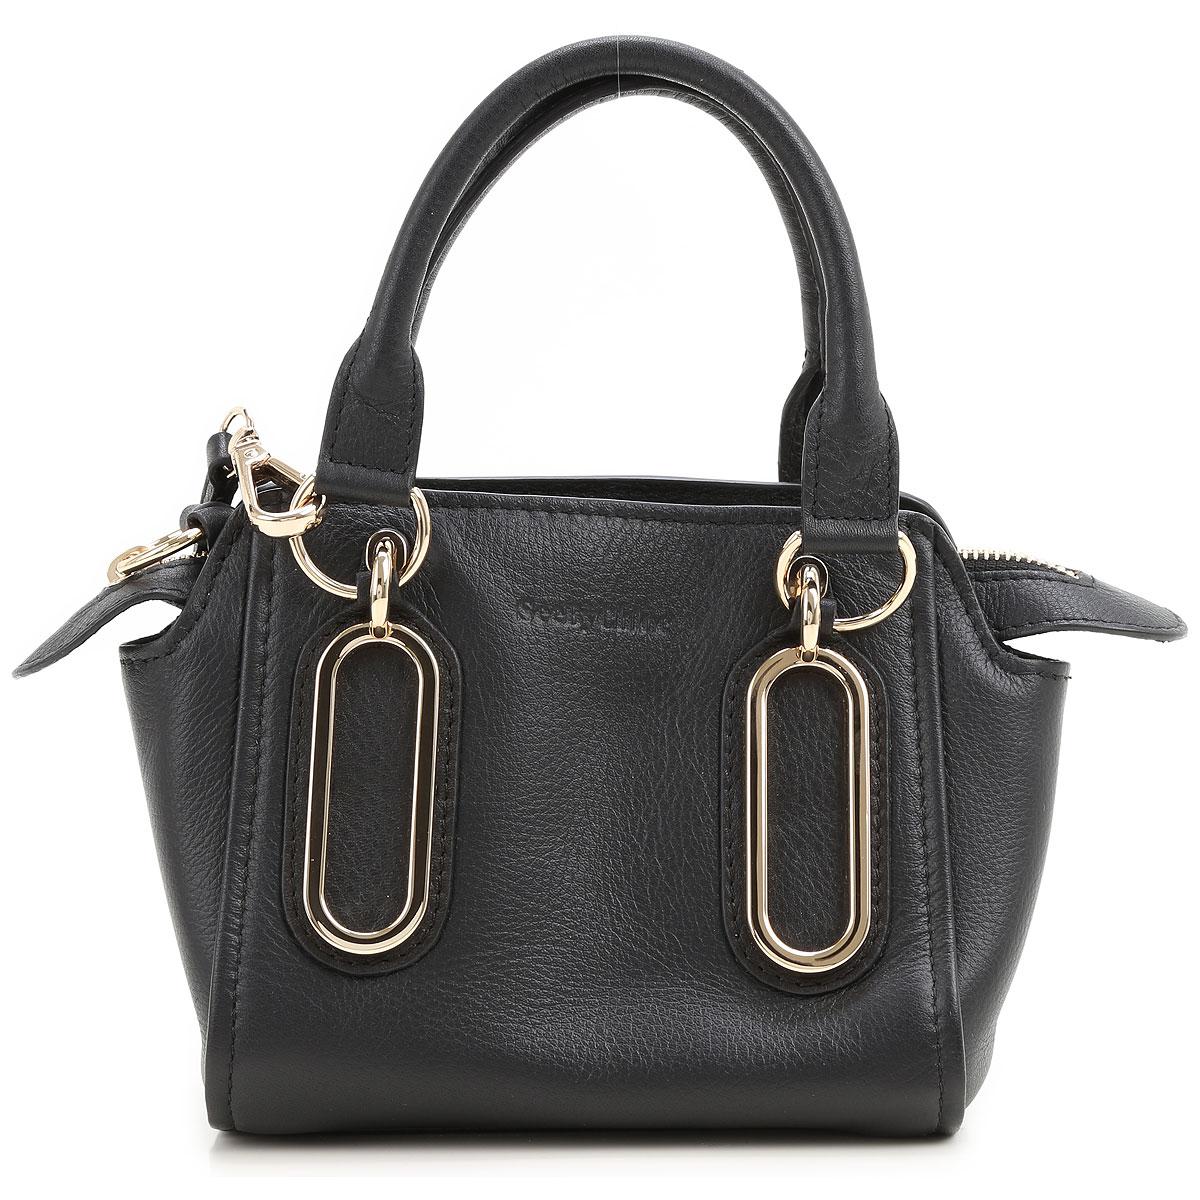 Image of Chloe Clutch Bag, Black, Leather, 2017